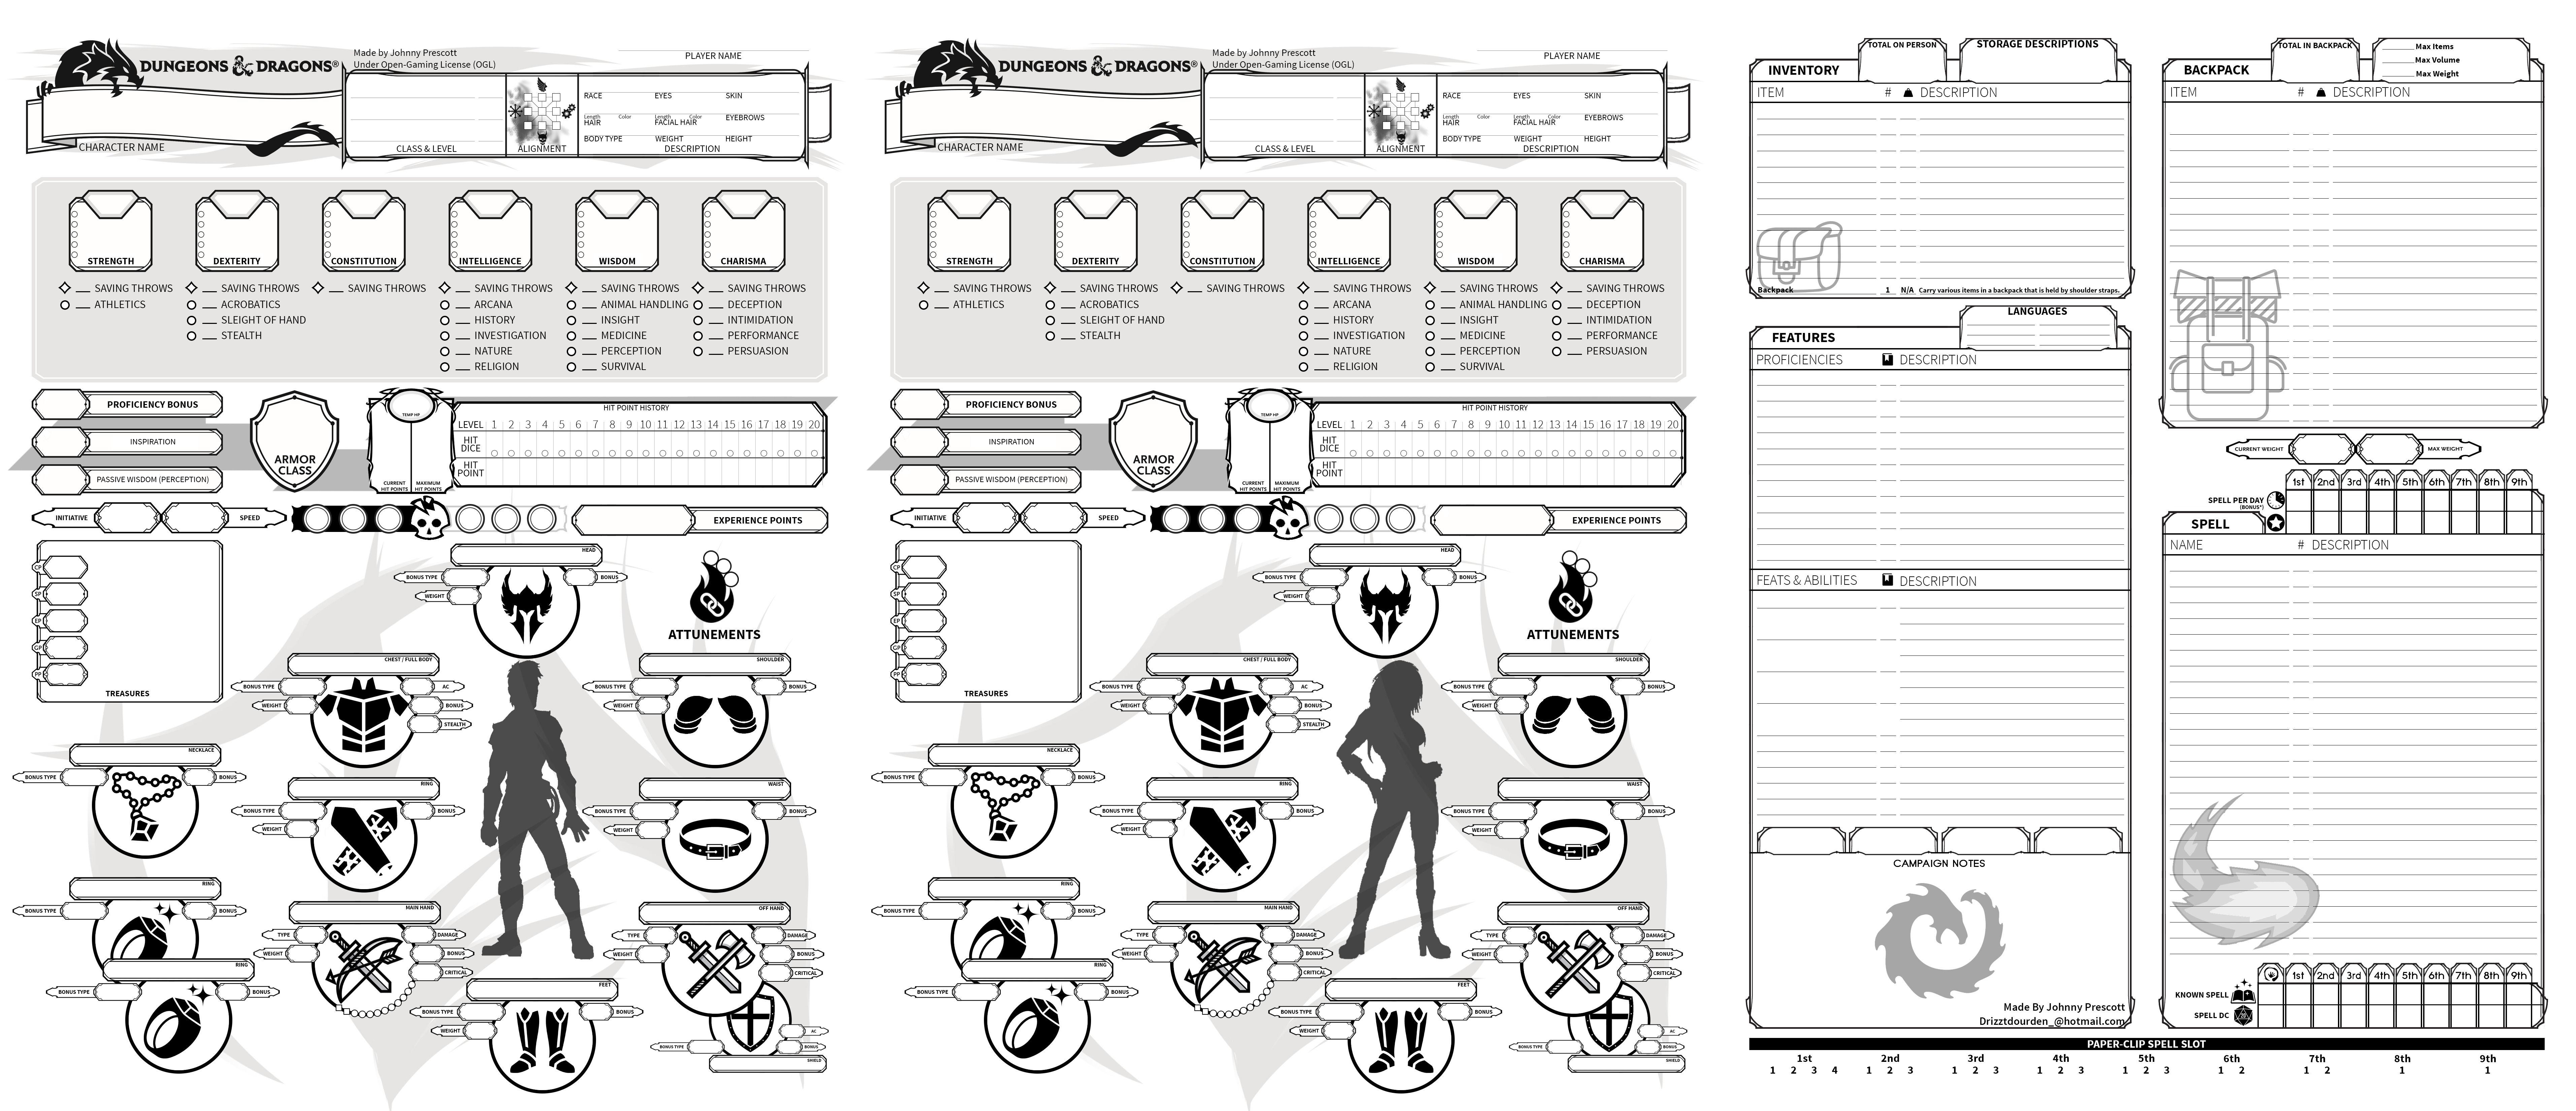 Pathfinder 2 Character Sheet Fillable